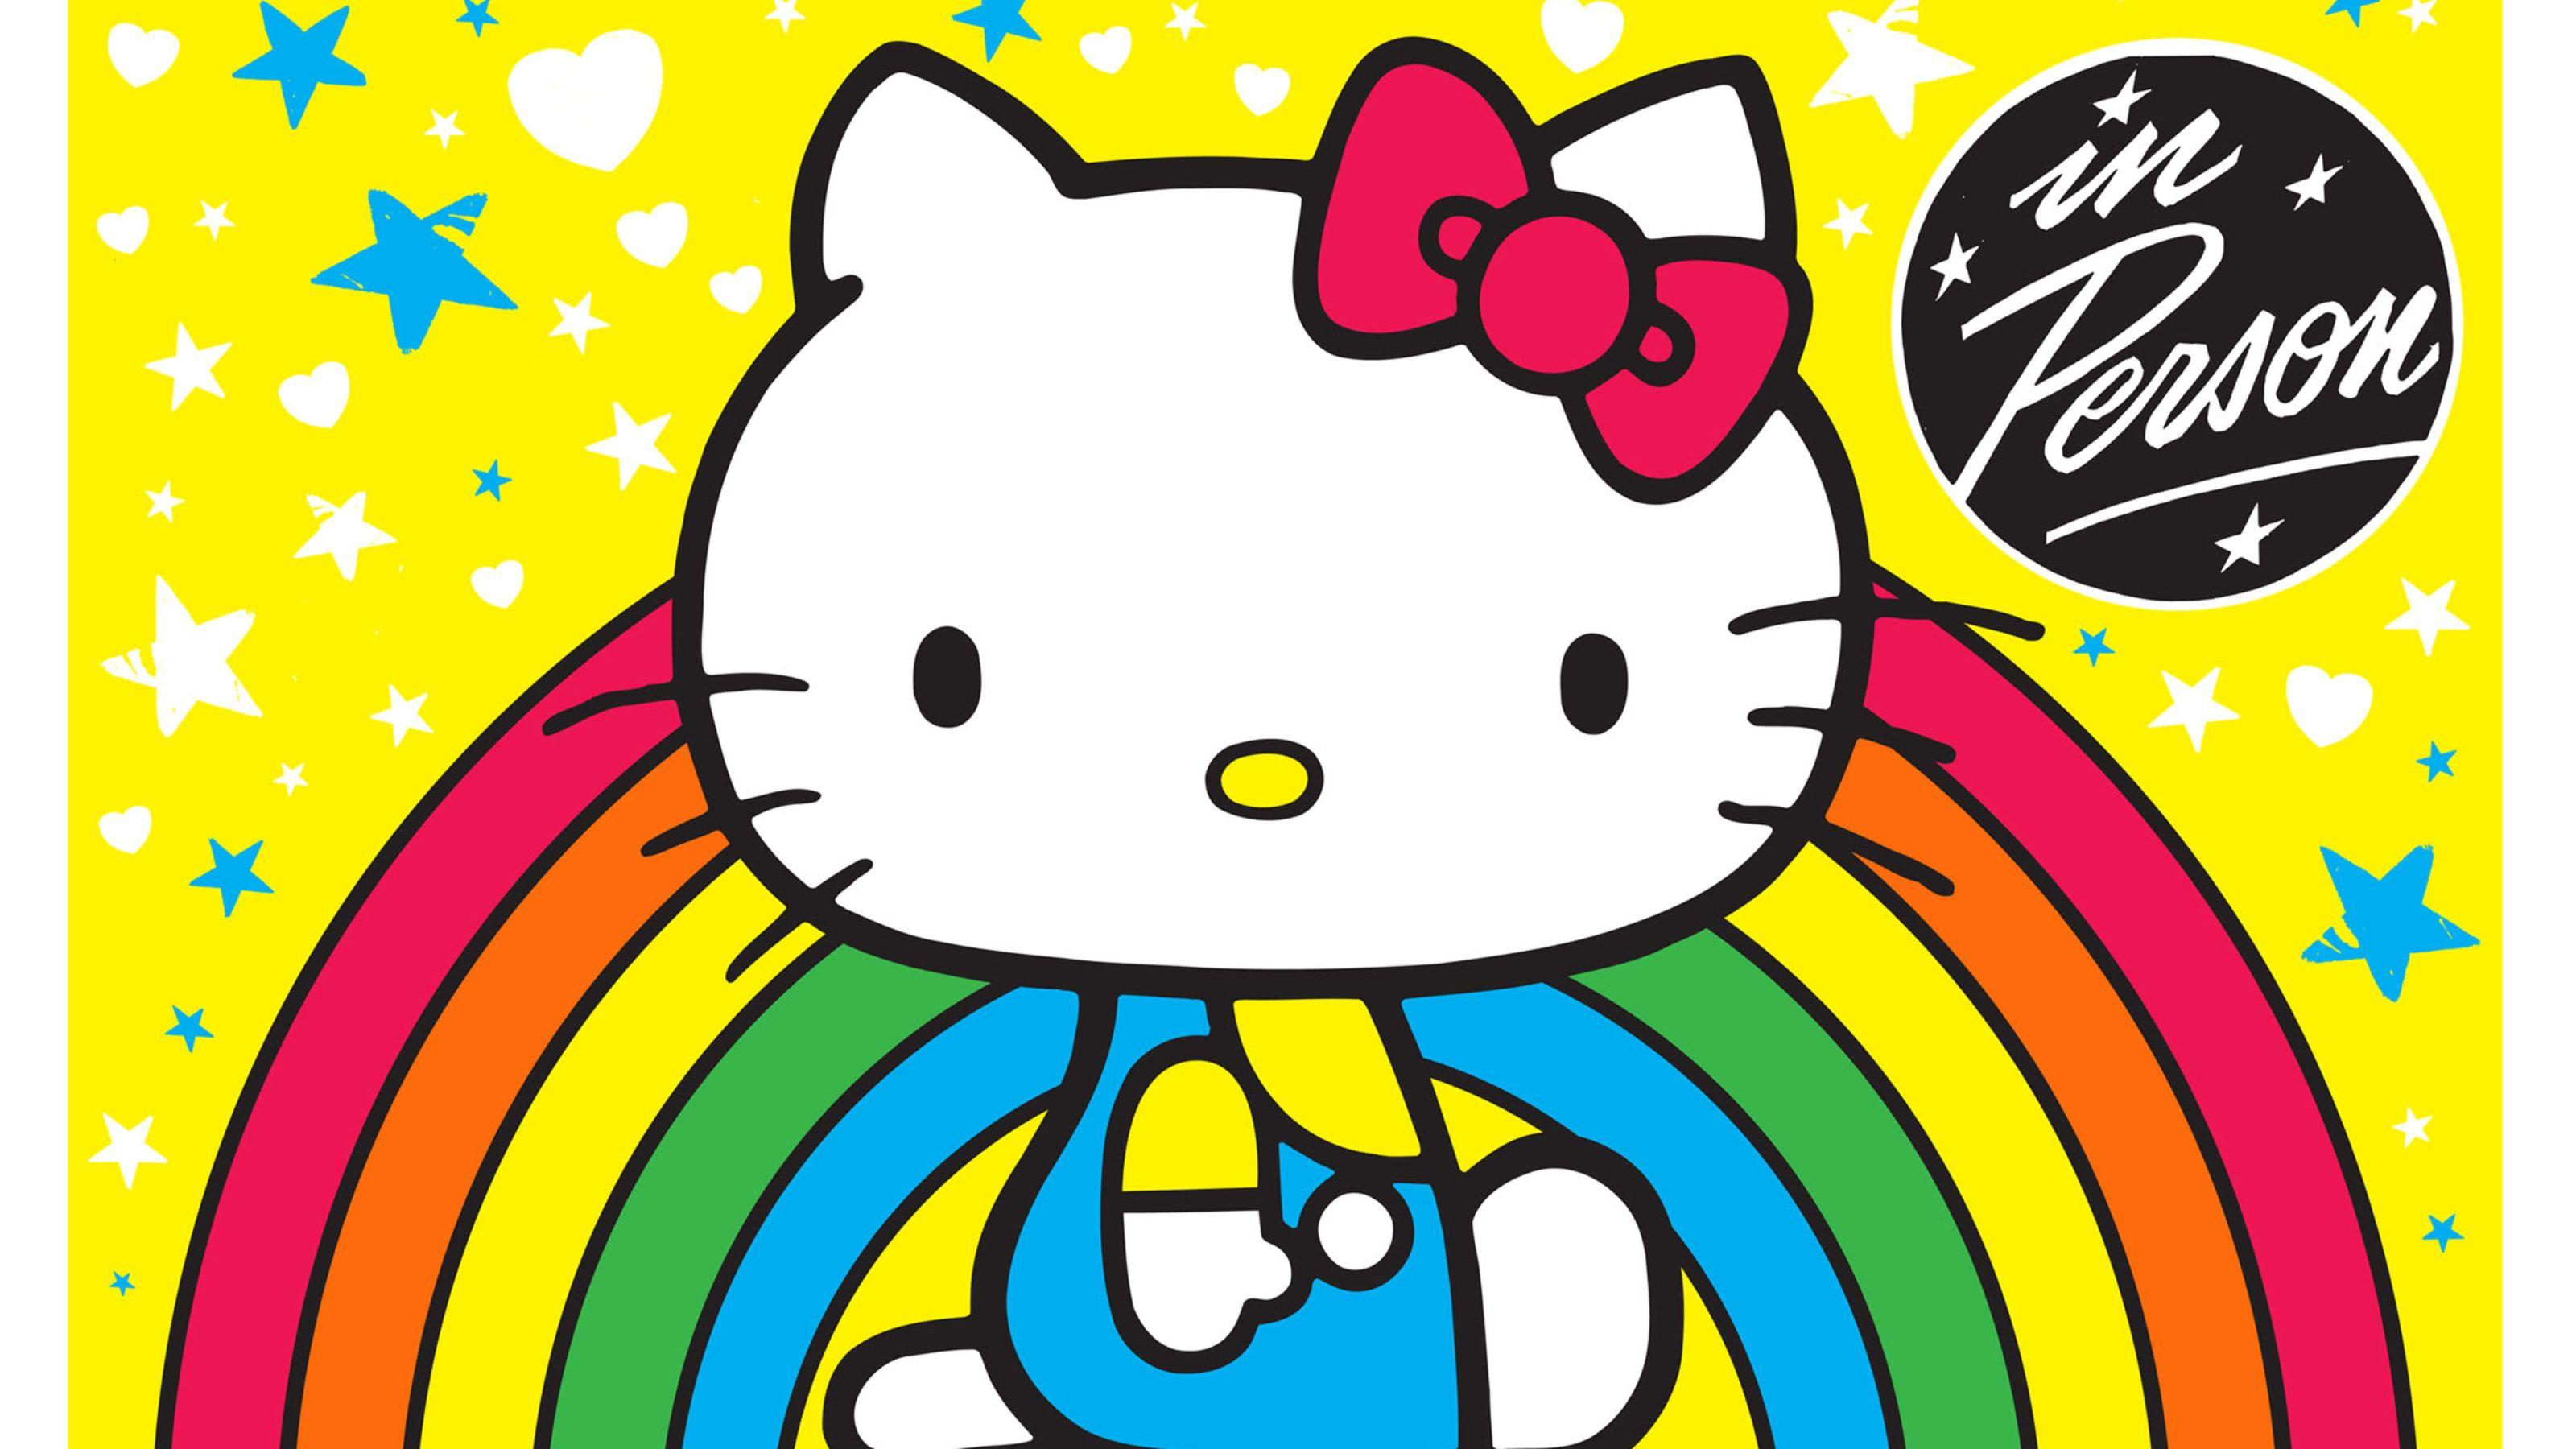 Top Wallpaper Hello Kitty Cell Phone - 833726-beautiful-cute-hello-kitty-wallpapers-3200x1800-cell-phone  Snapshot_79984.jpg